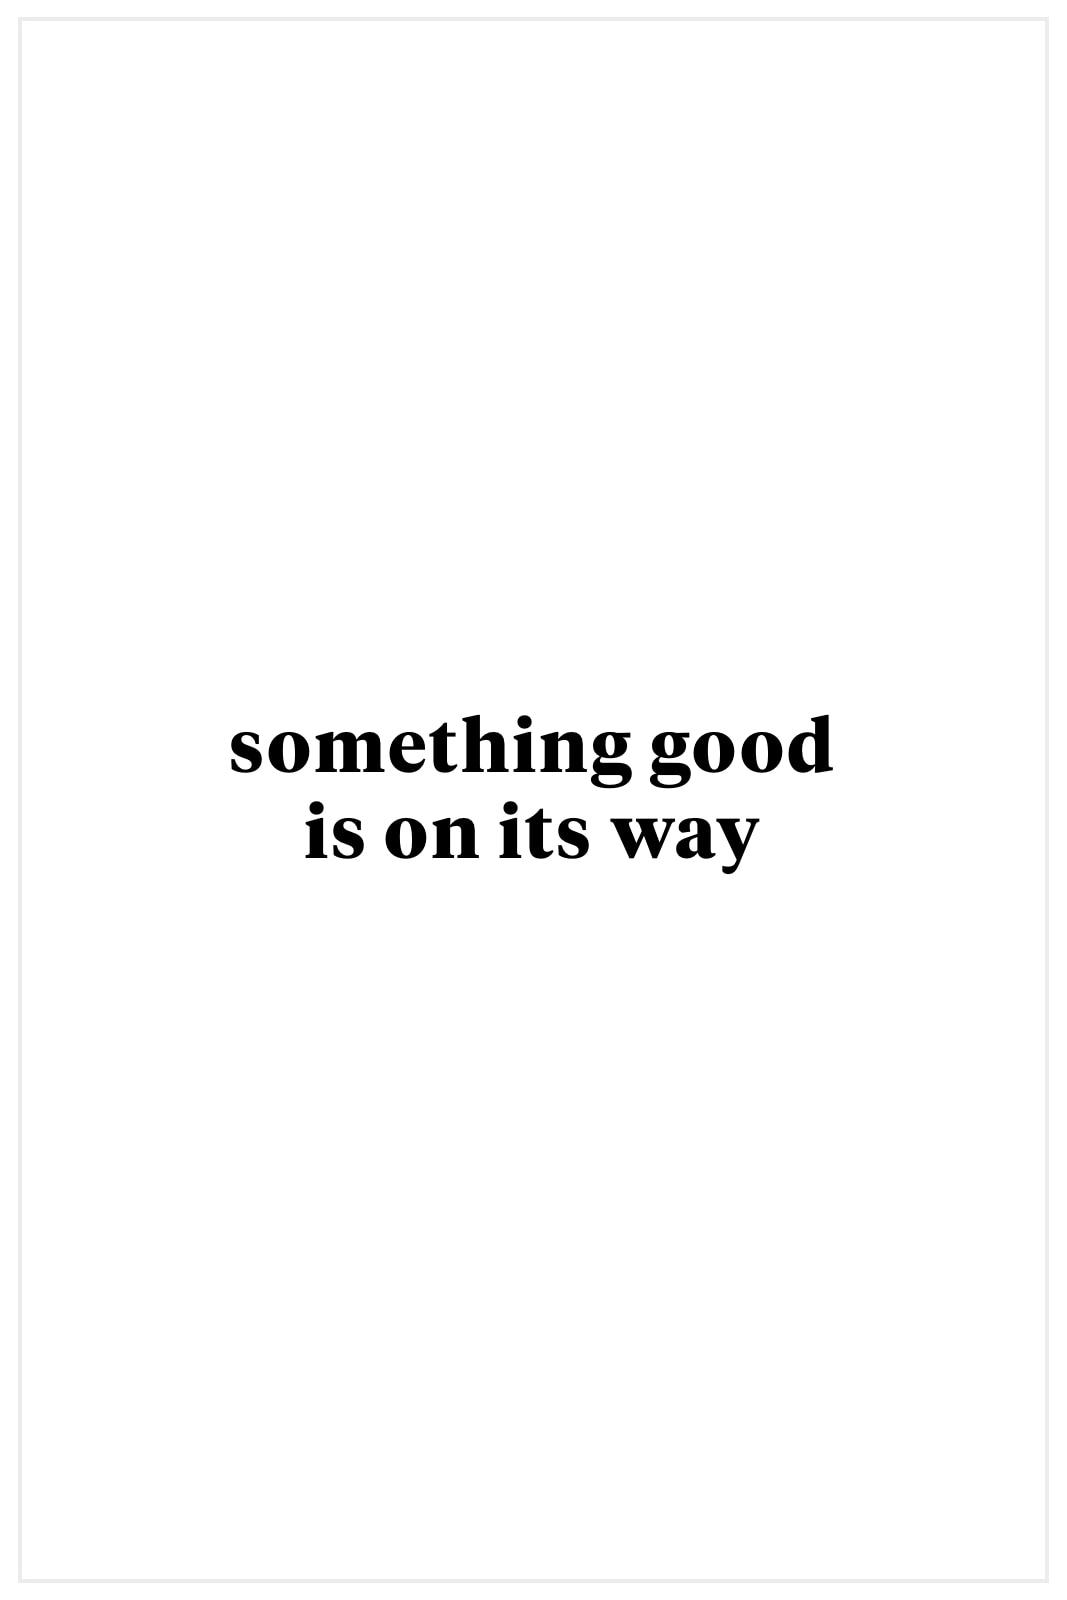 Simbi haiti Brave Bracelet